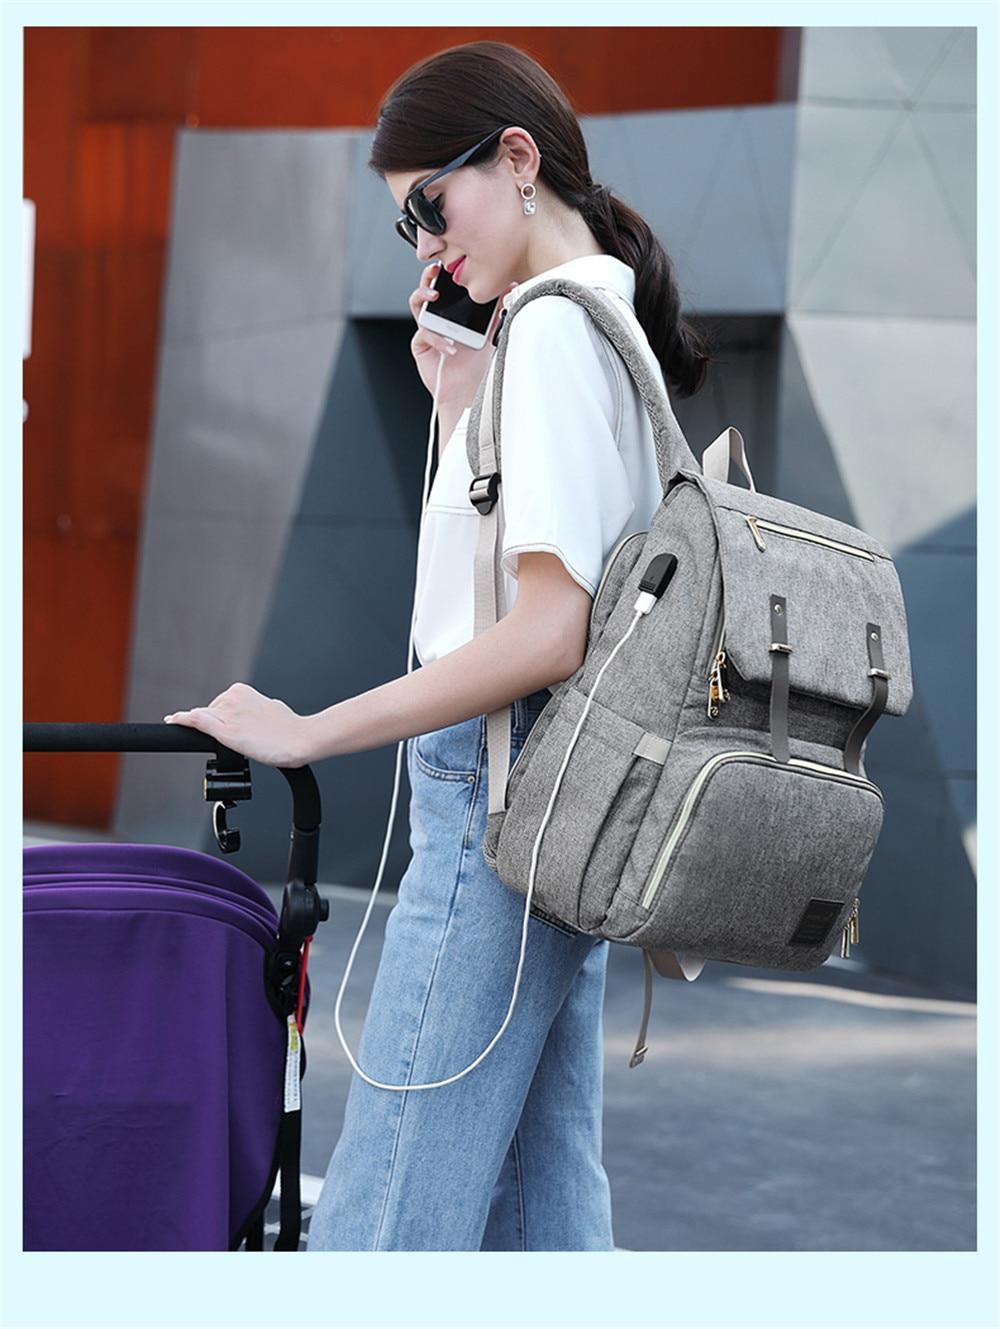 HTB15Fkvah2rK1RkSnhJq6ykdpXam Fashion Large Capacity Baby Nappy Bag Diaper Bag Purse Multifunction USB Mummy Travel Backpack Women Nursing Bags For Mom Daddy